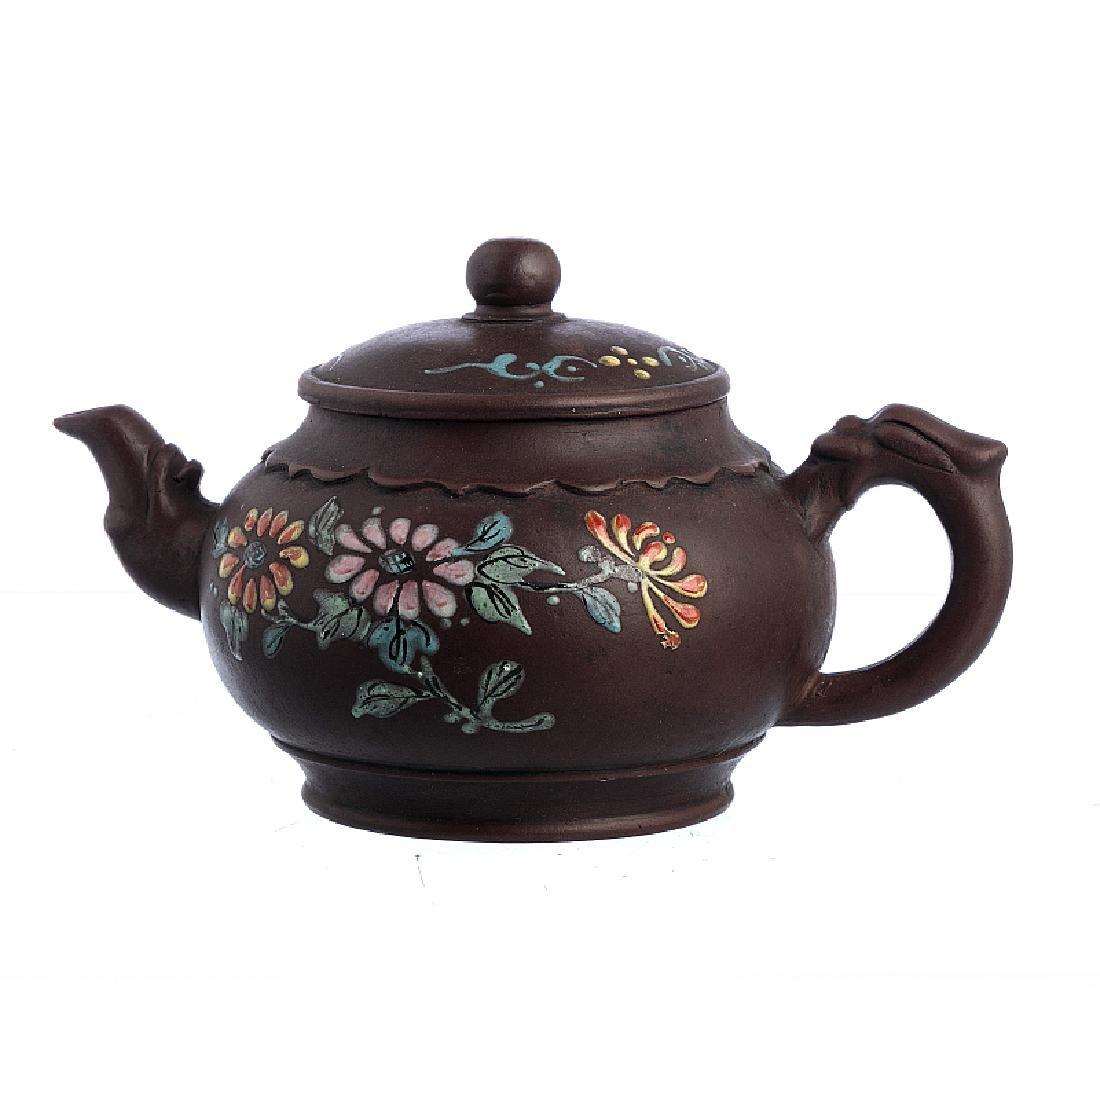 """Flowers"" teapot"" in Yixing ceramics"